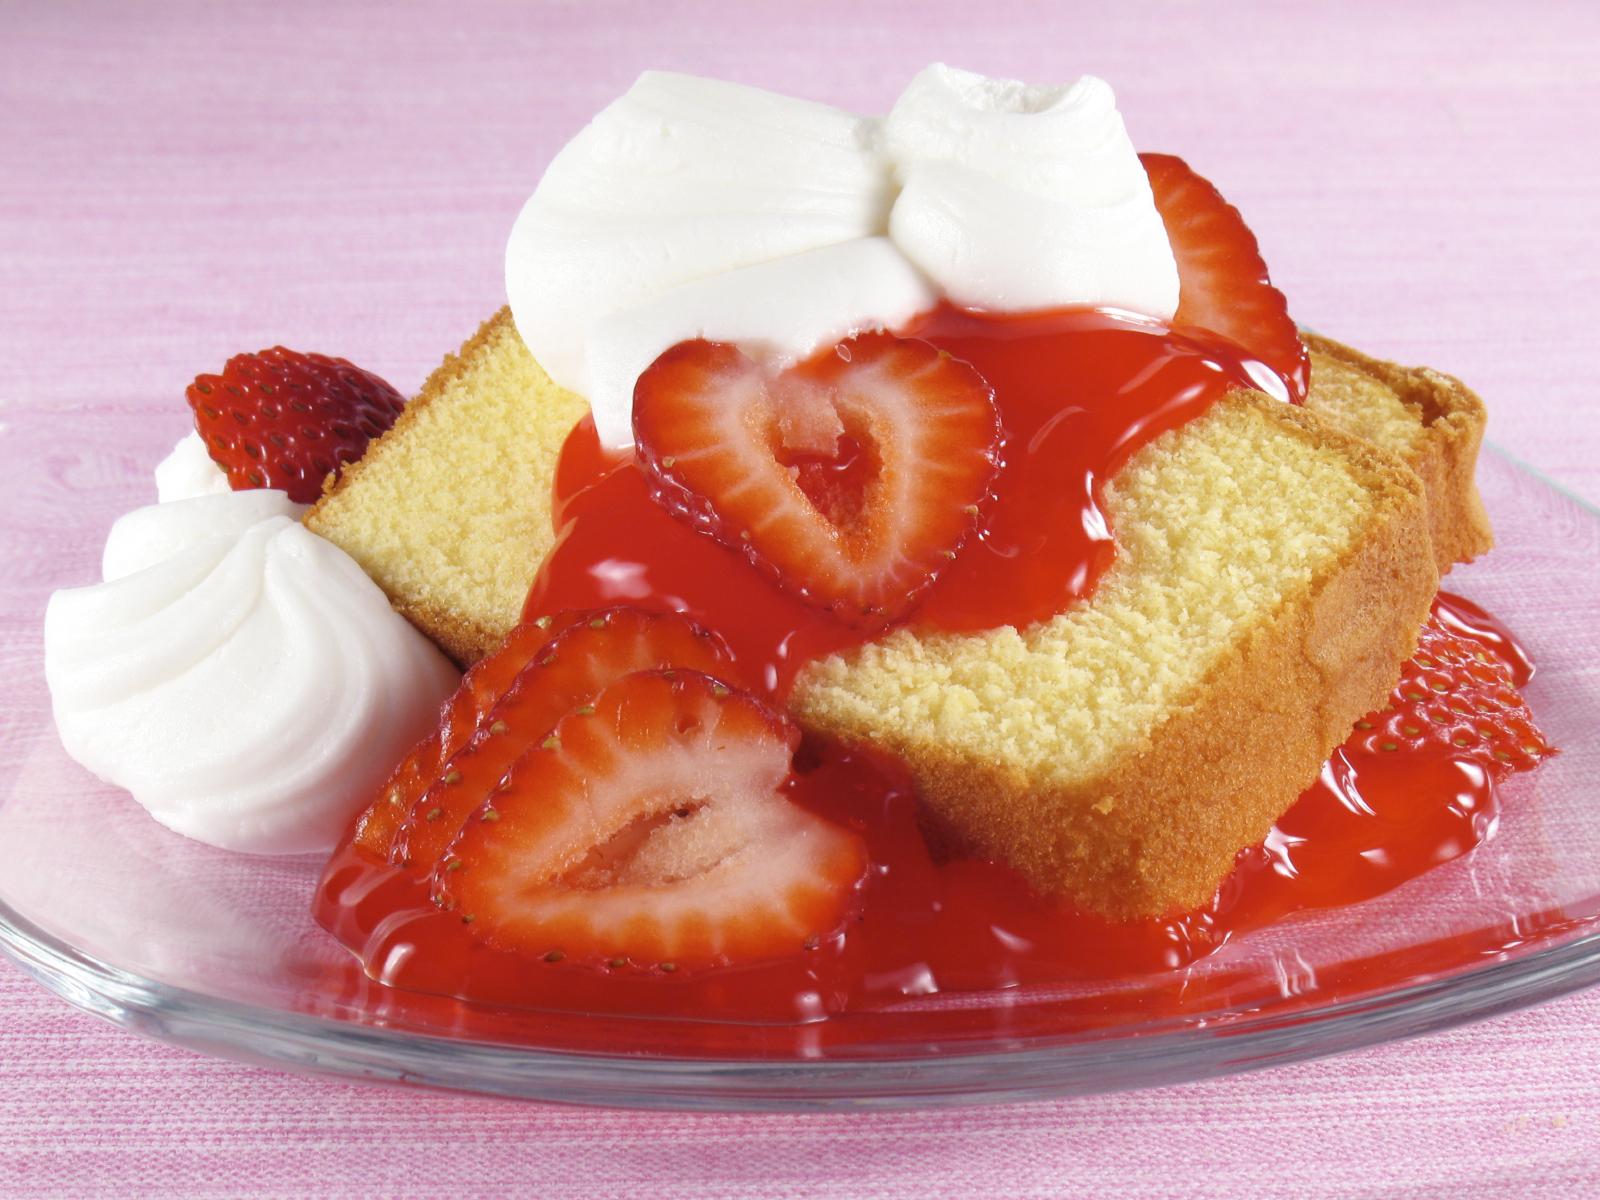 Lemon cake with strawberries